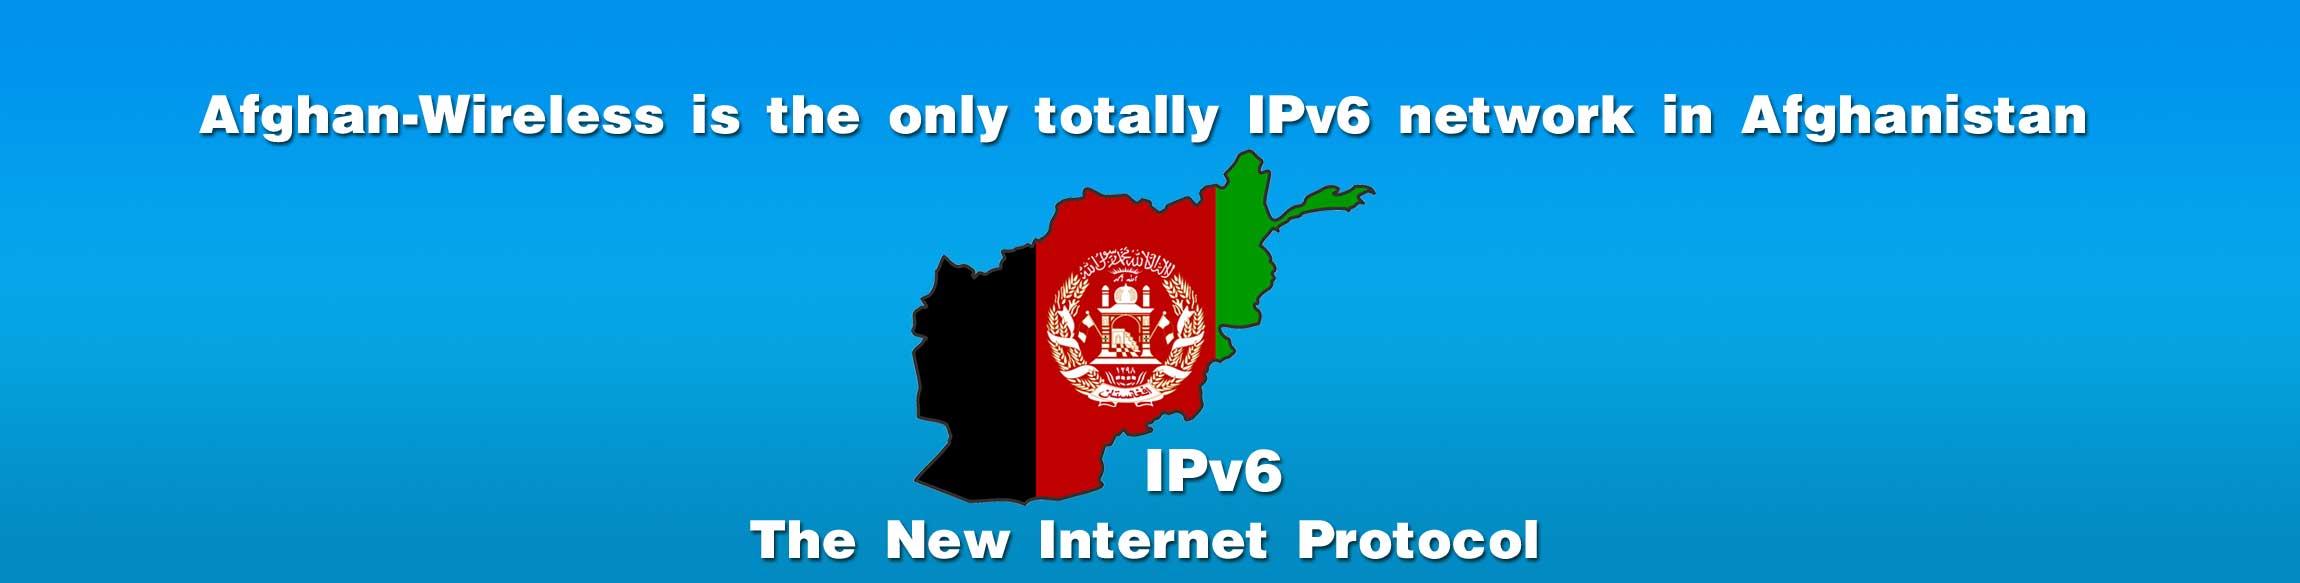 AWCC-IPv6-(B)